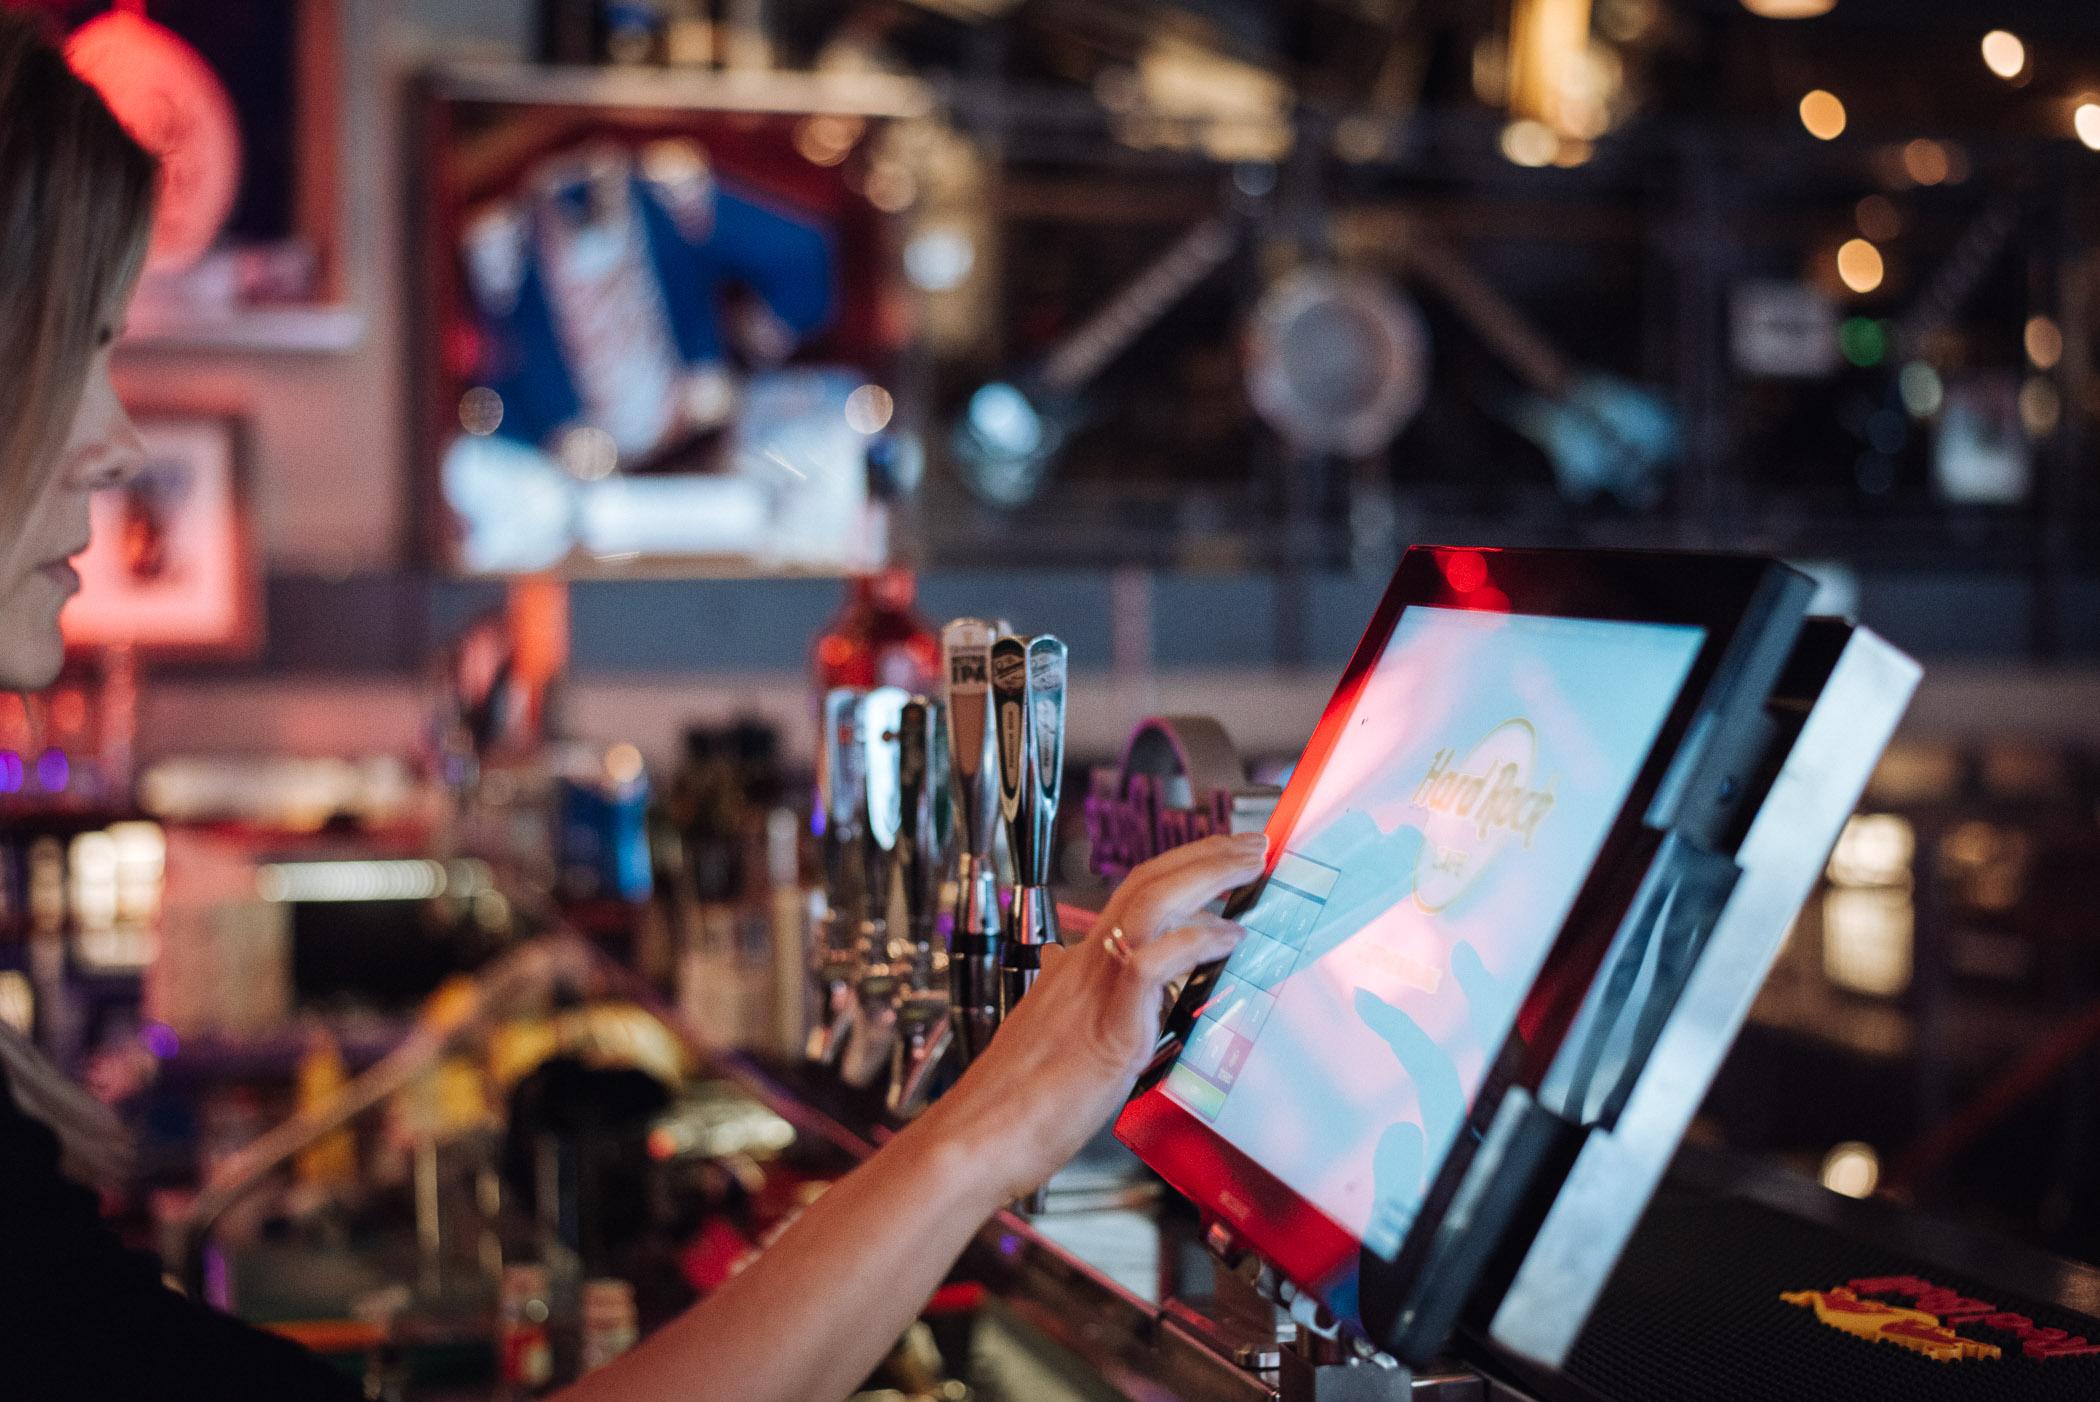 Kassesystemer til restauranter, barer og kaféer samt barautomatisering